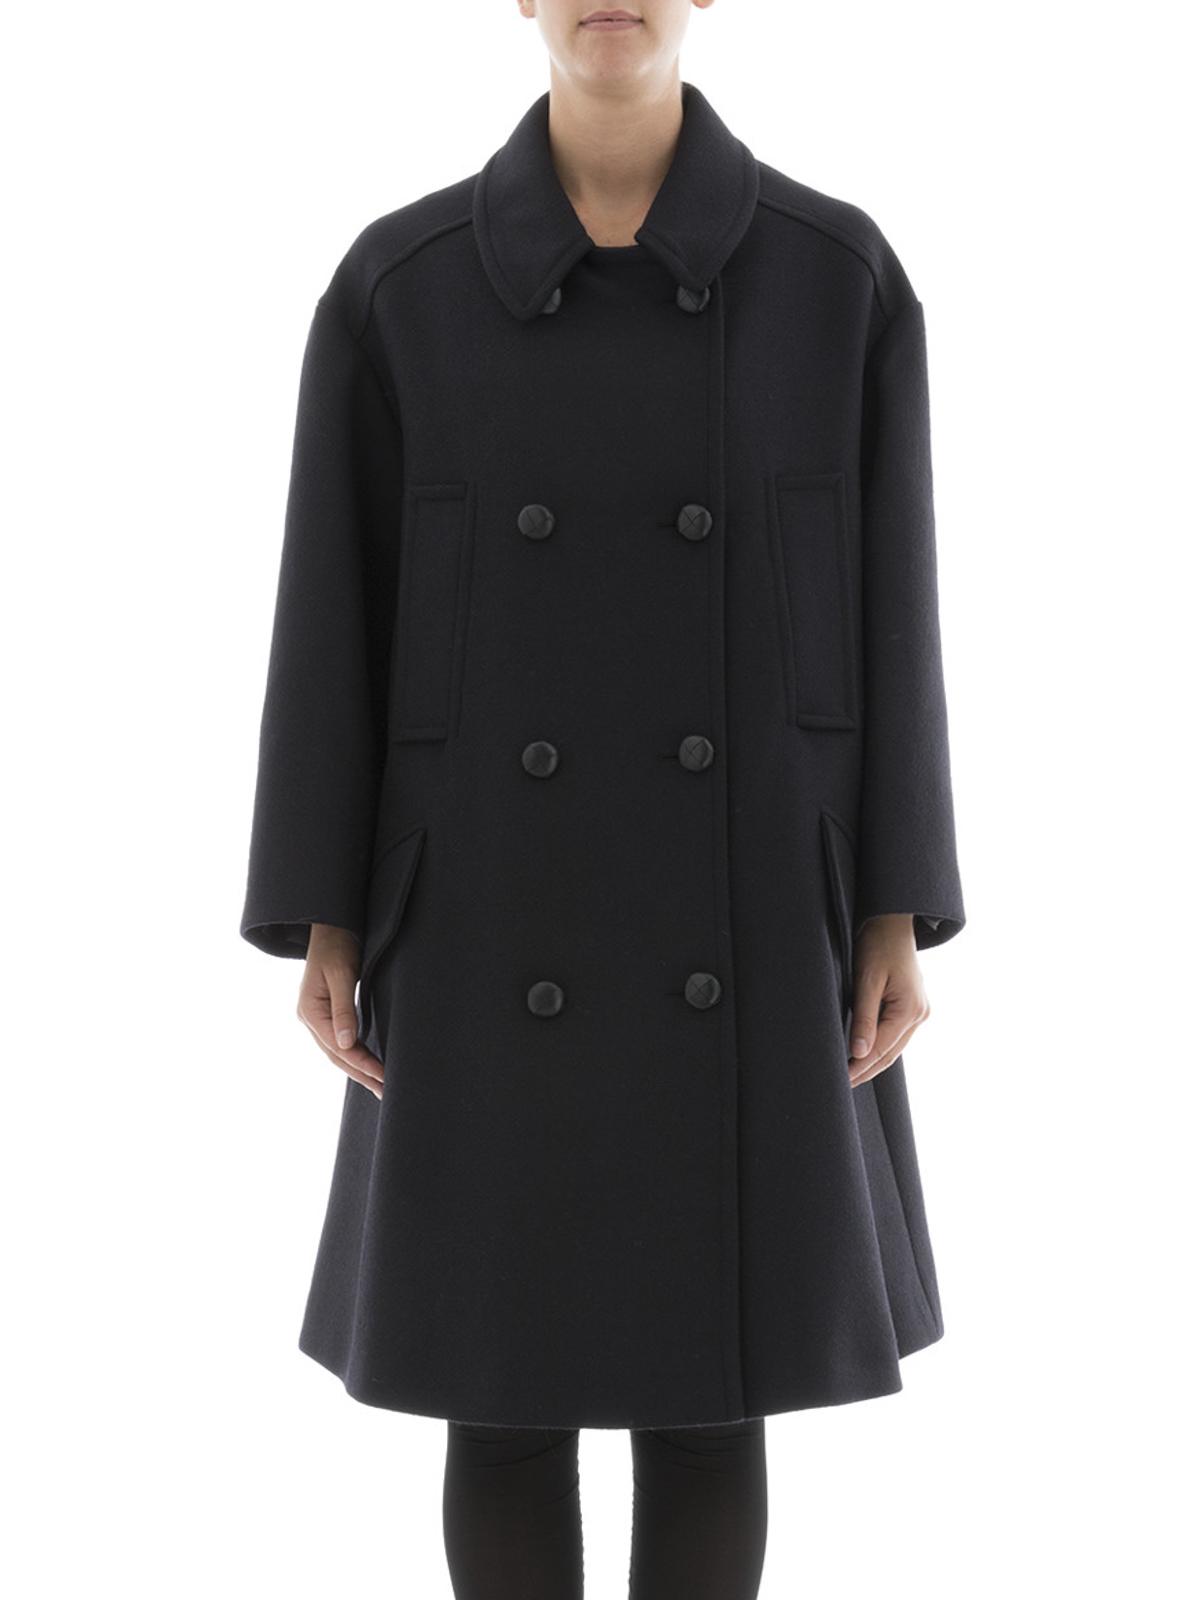 Isabel marant etoile - Flicka double-breasted over coat - long coats - MA026317A007E30DM